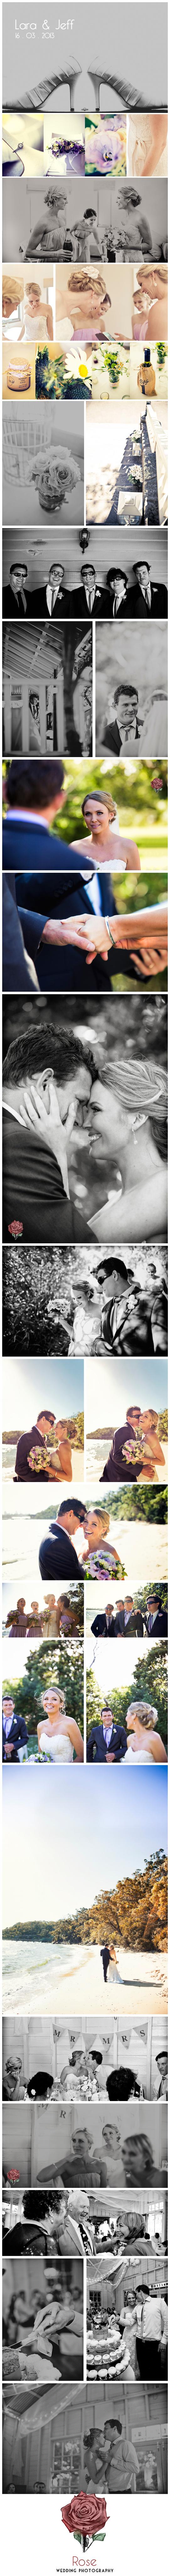 Lara Cox, Jeff Springer, Norther beaches wedding, sydney wedding, rose wedding photography, Athol Hall, Mosman Wedding.